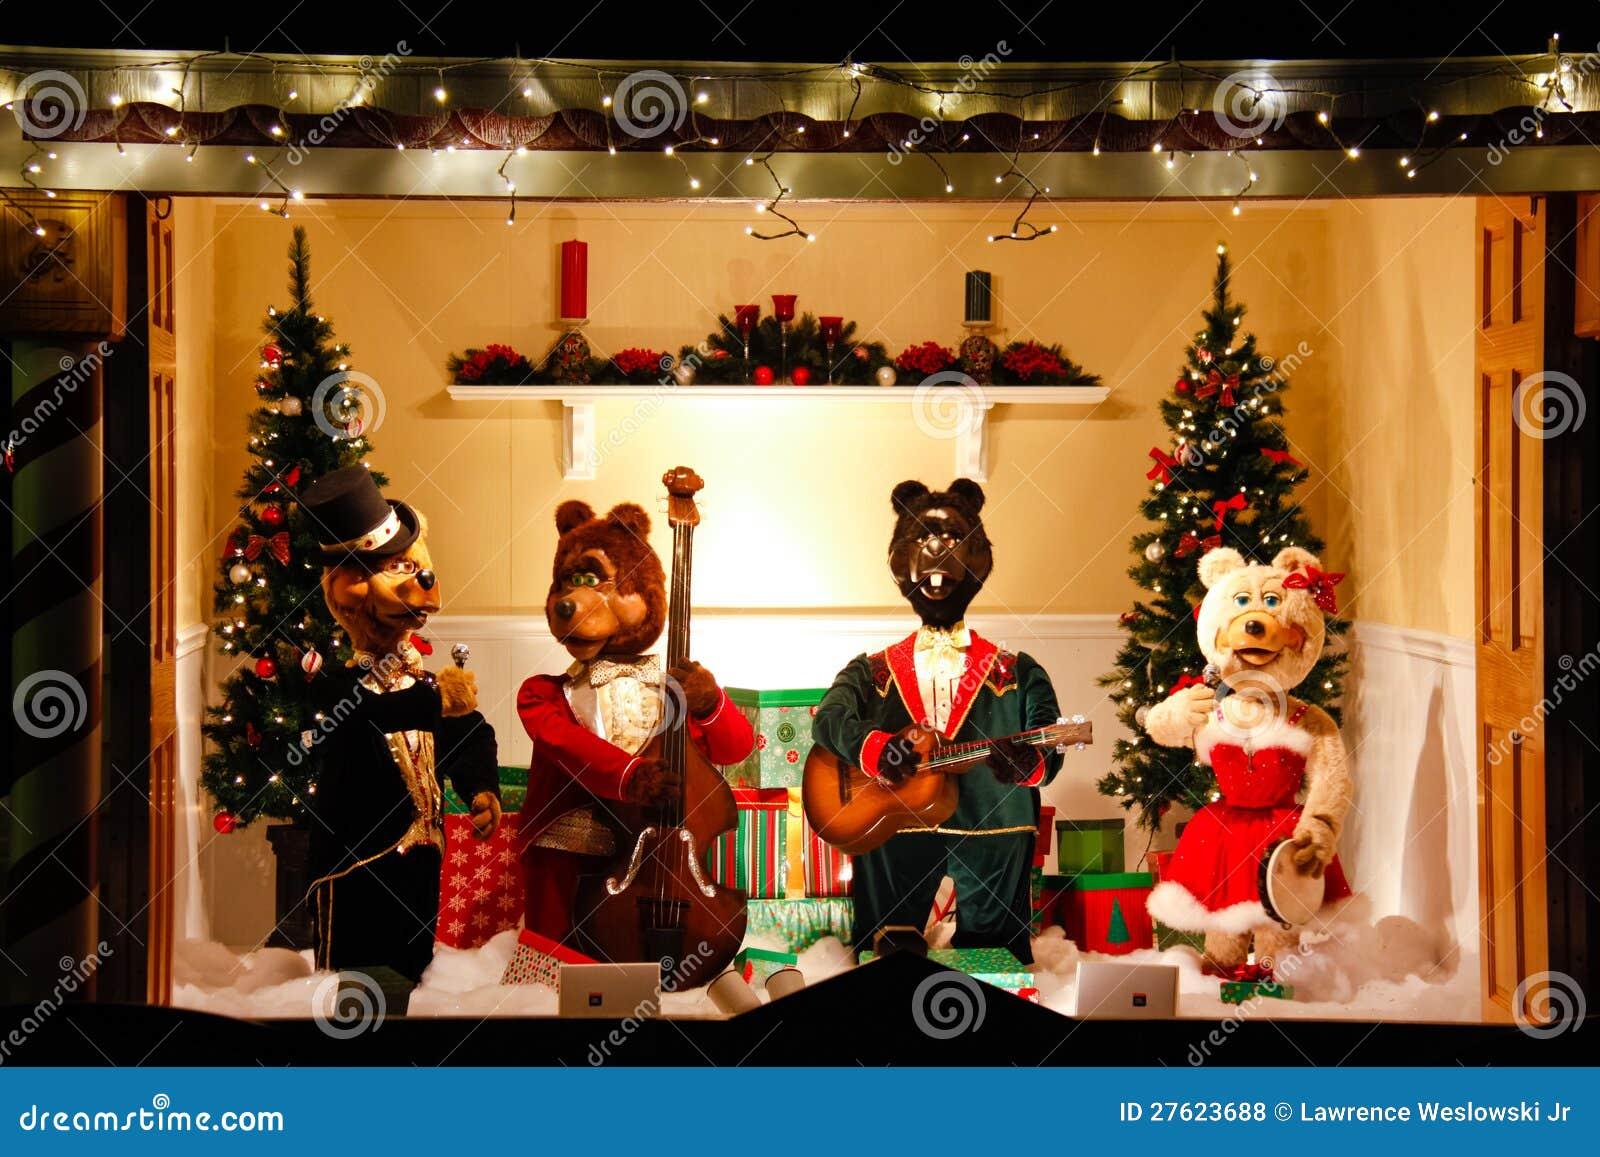 Christmas Singing Bear Display Royalty Free Stock Photos ... - photo#24